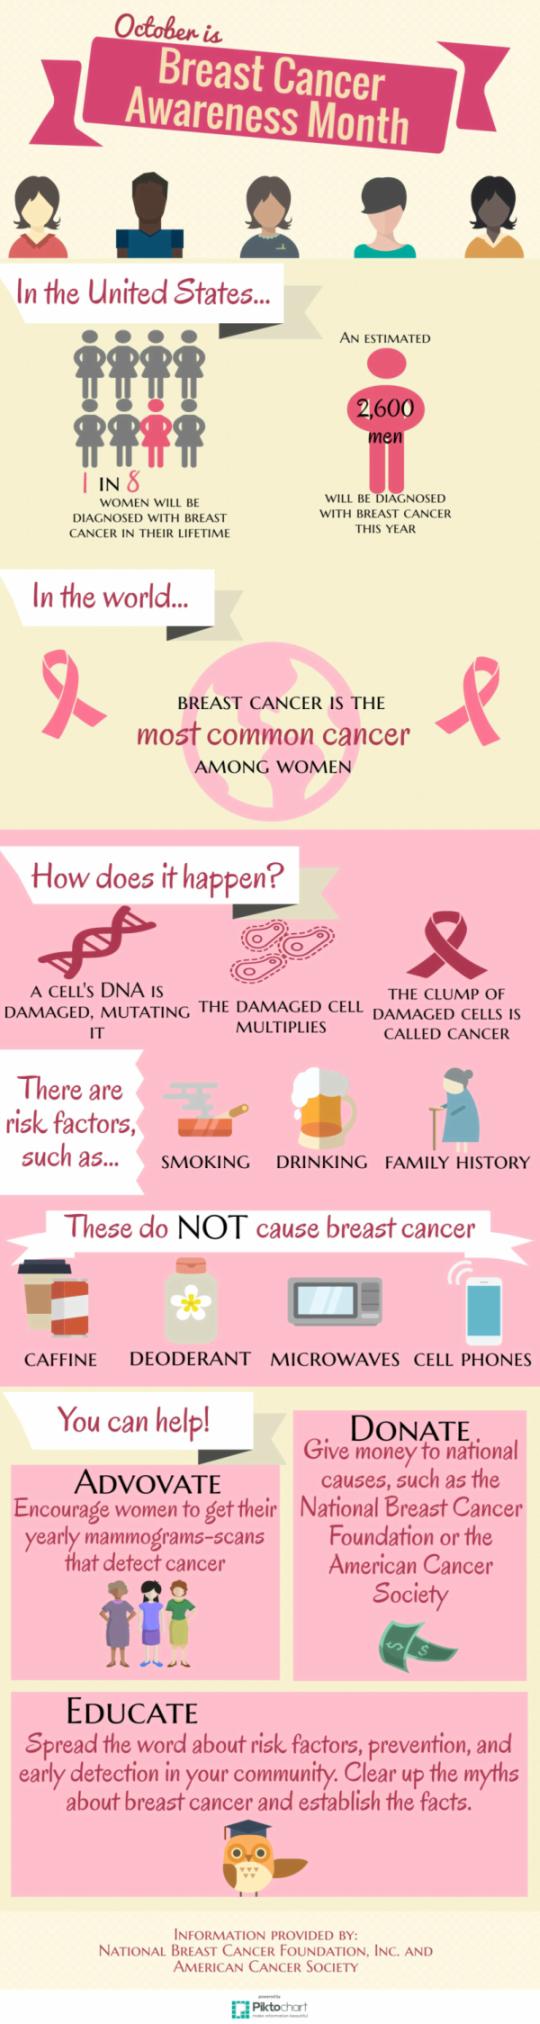 breast-cancer-a_16668982_fd64f4b9b5dec9384d69b70b1a654c8990e8a9ba